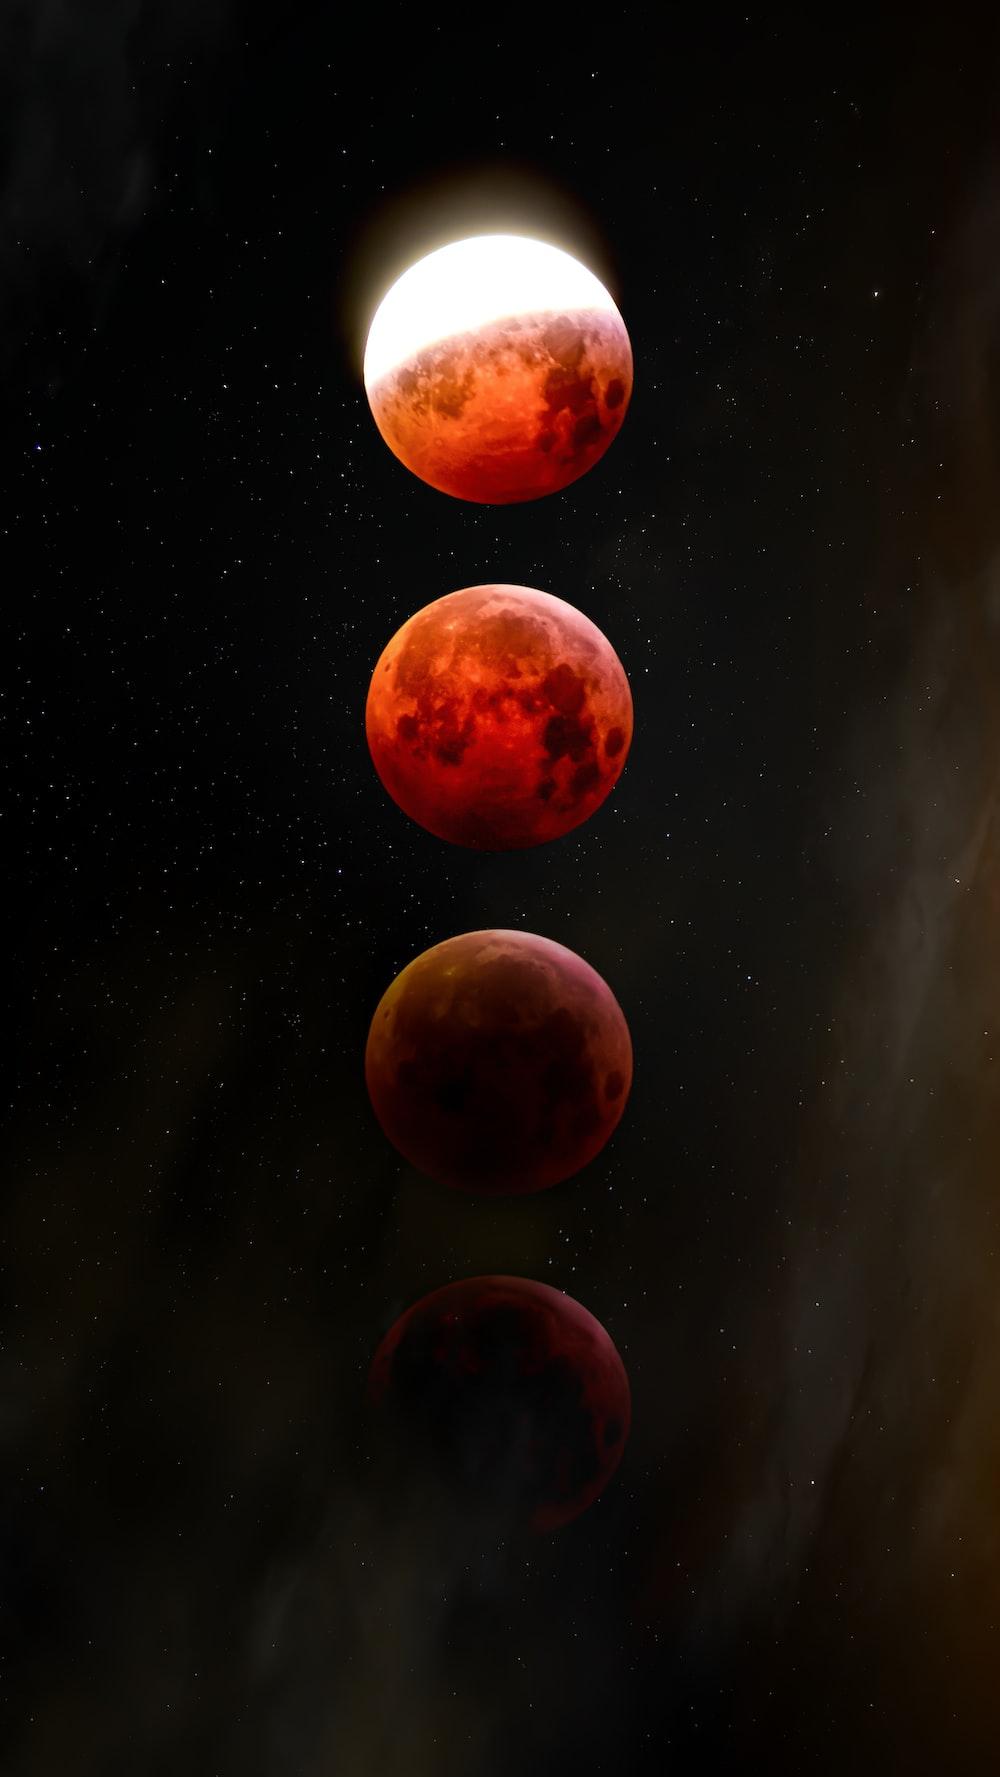 Moon Wallpapers Free HD Download [21+ HQ]   Unsplash